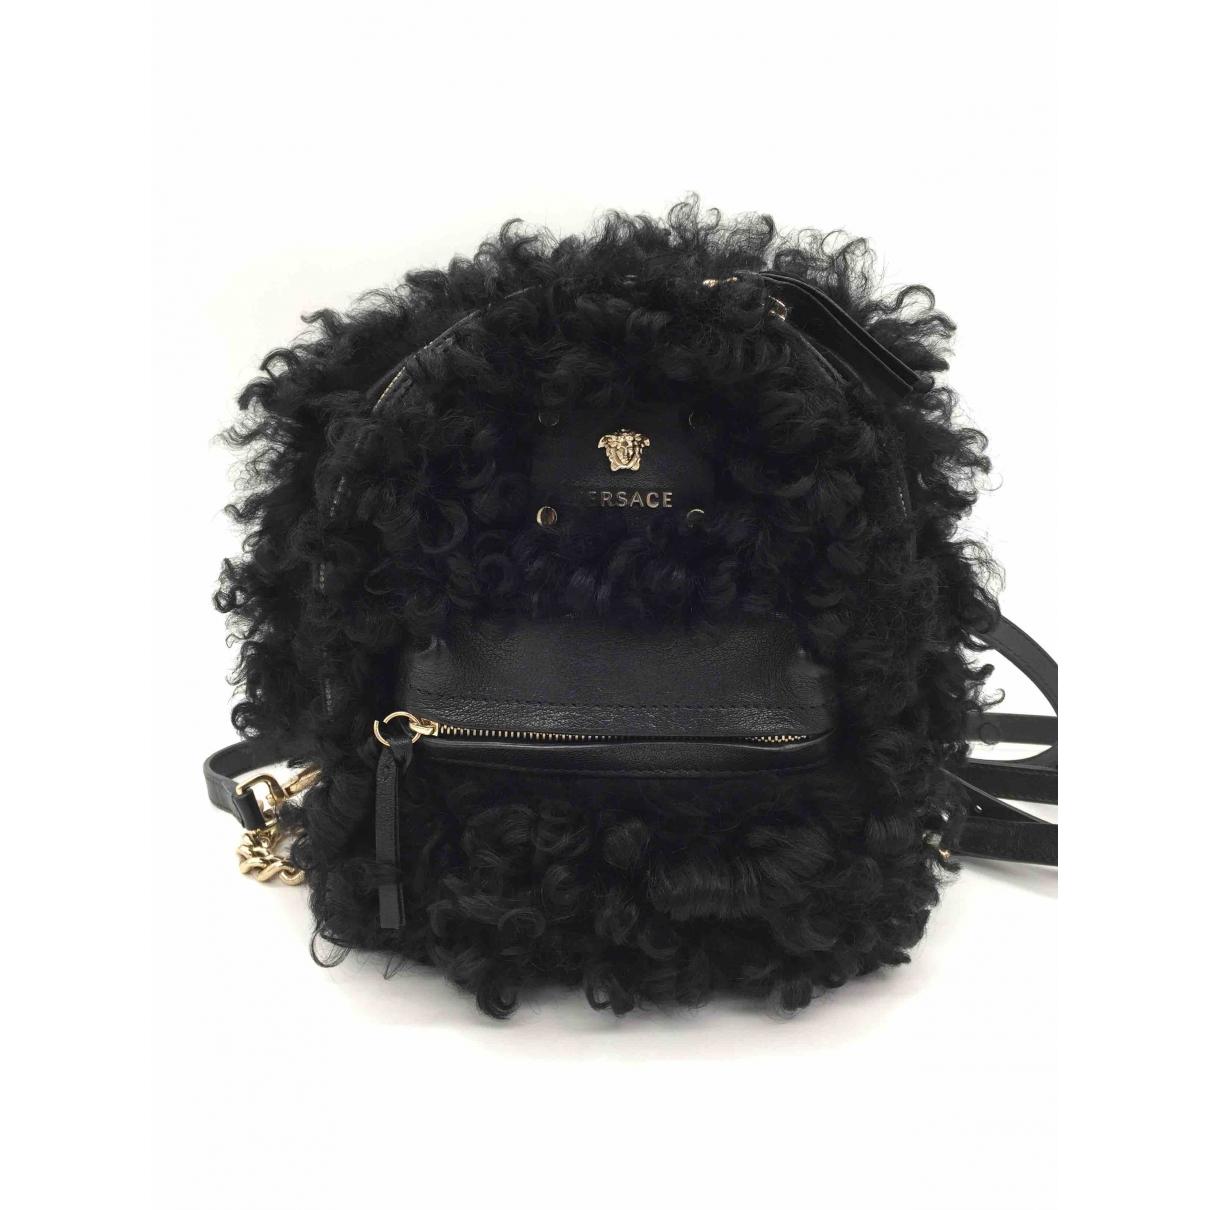 Versace \N Rucksaecke in  Schwarz Leder